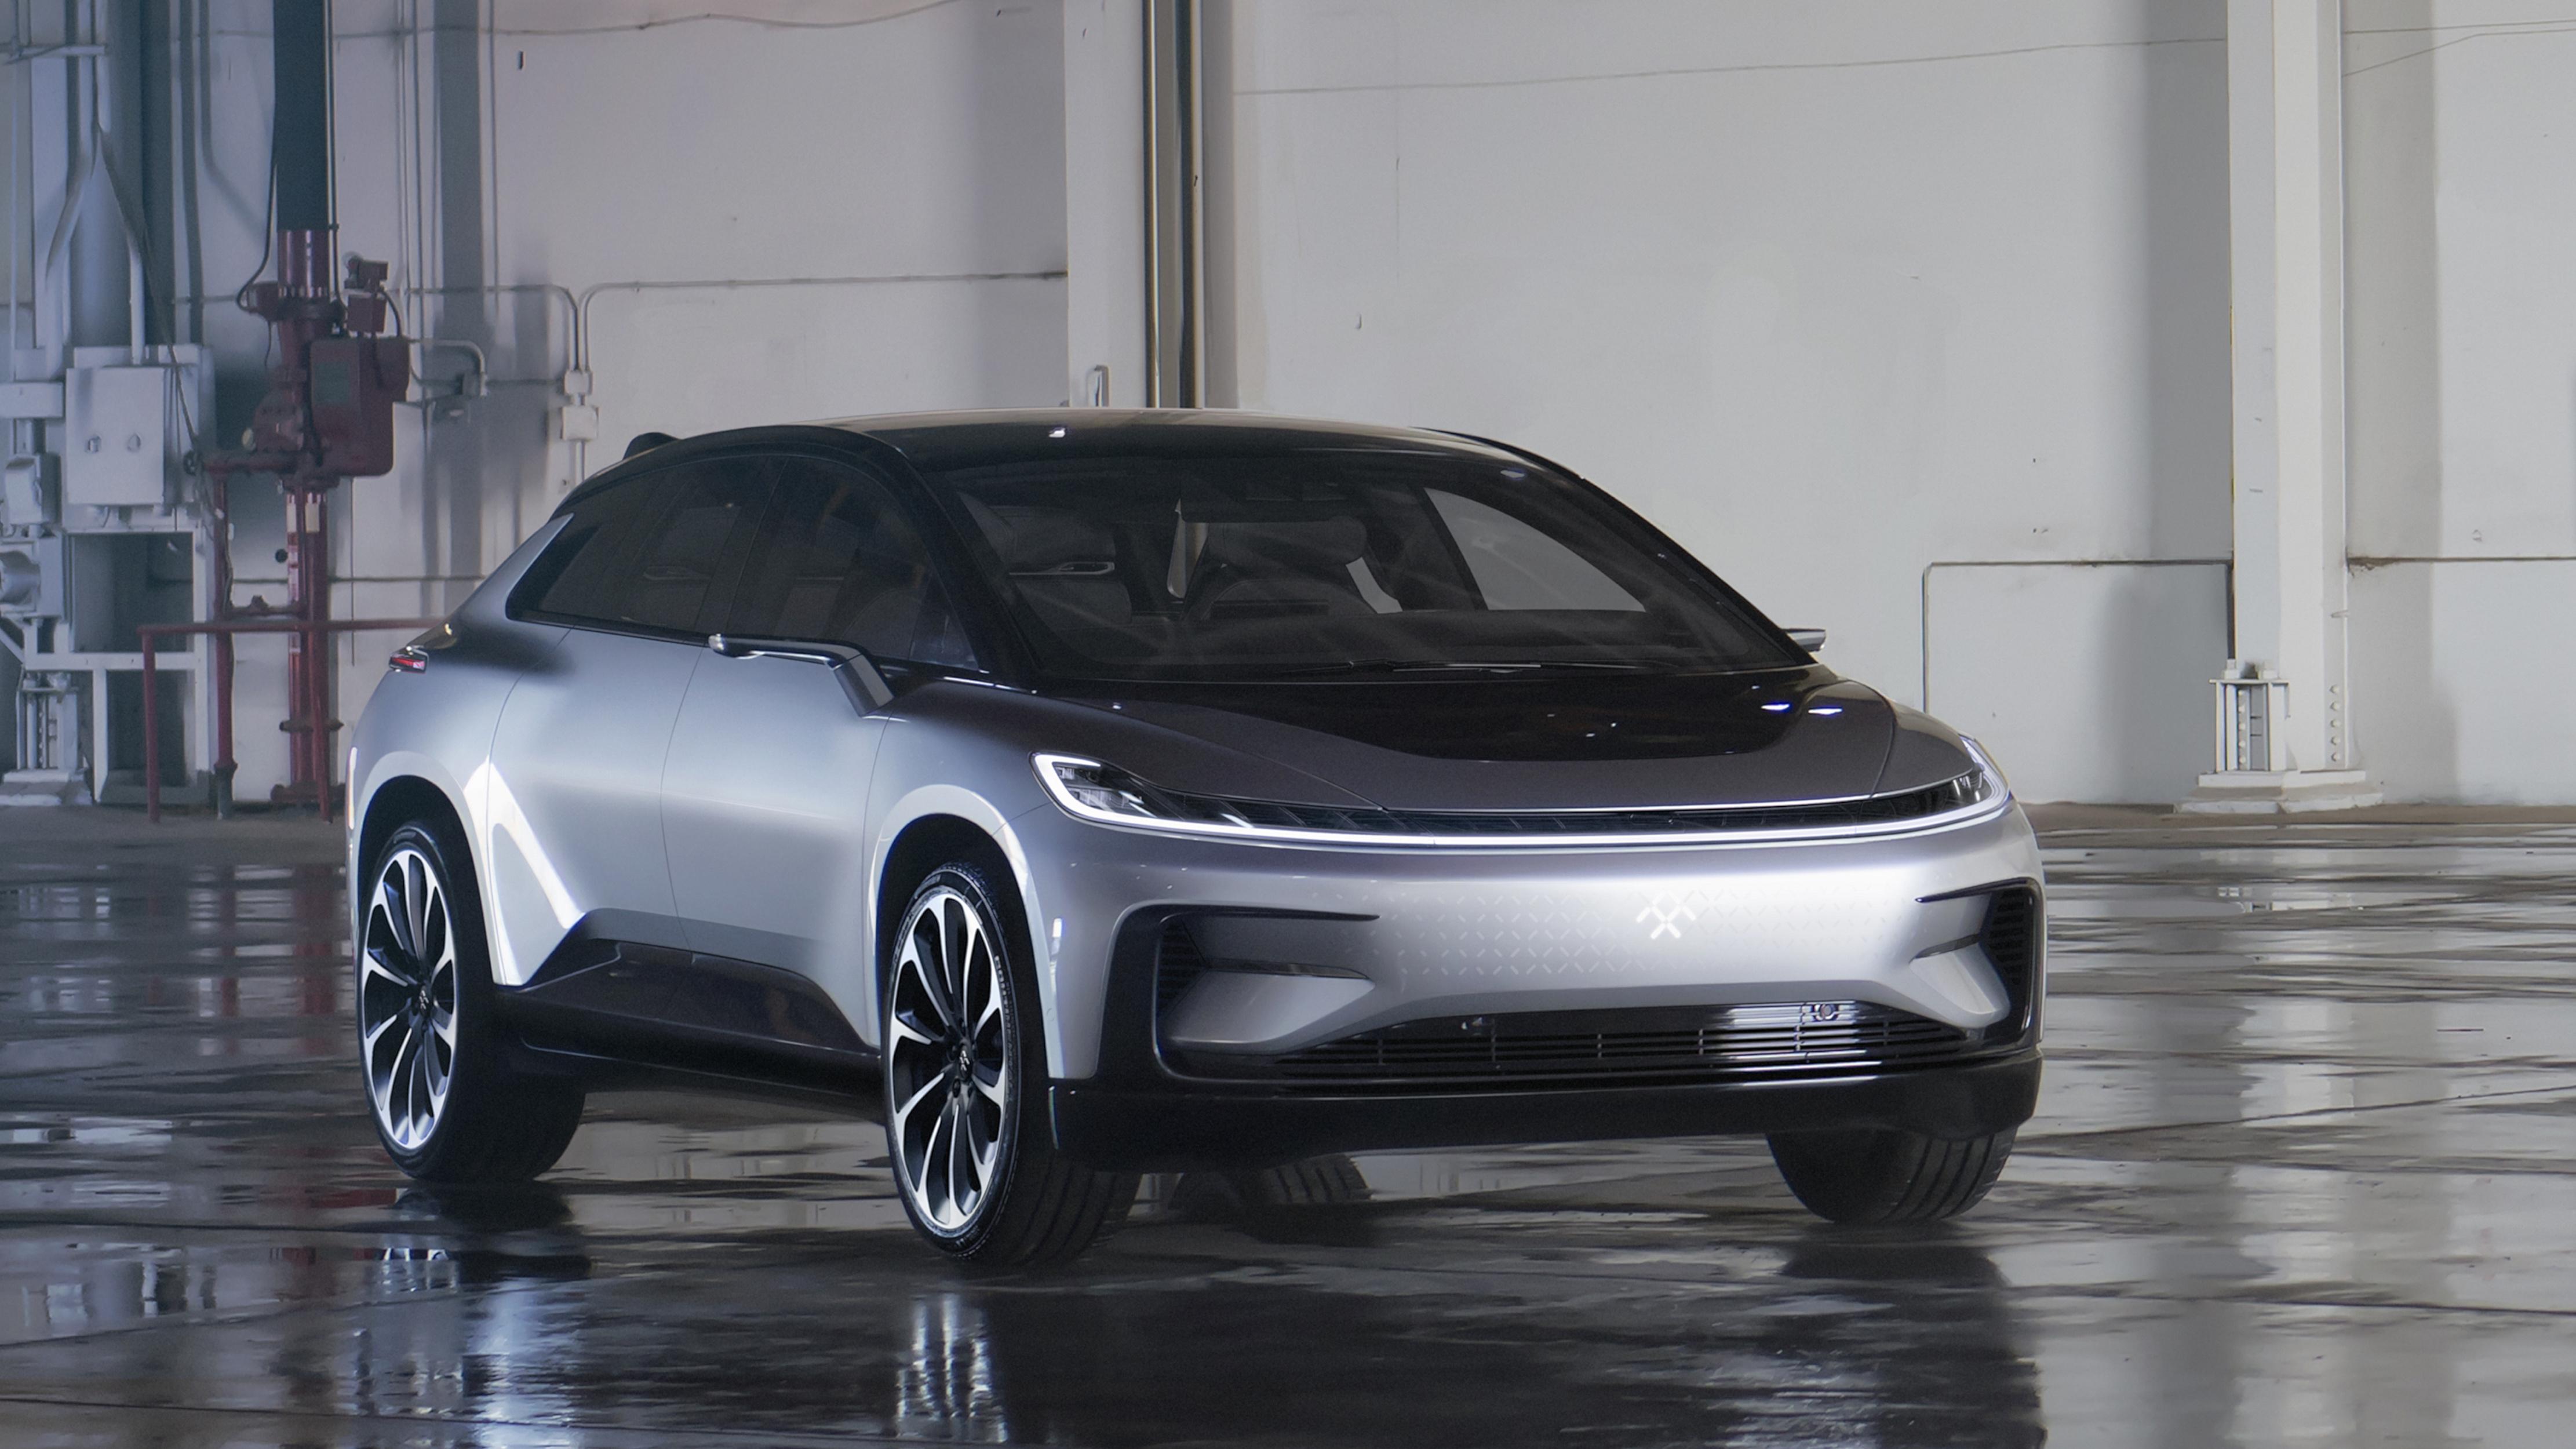 Faraday Future stellt das E-SUV FF 91 in Las Vegas vor